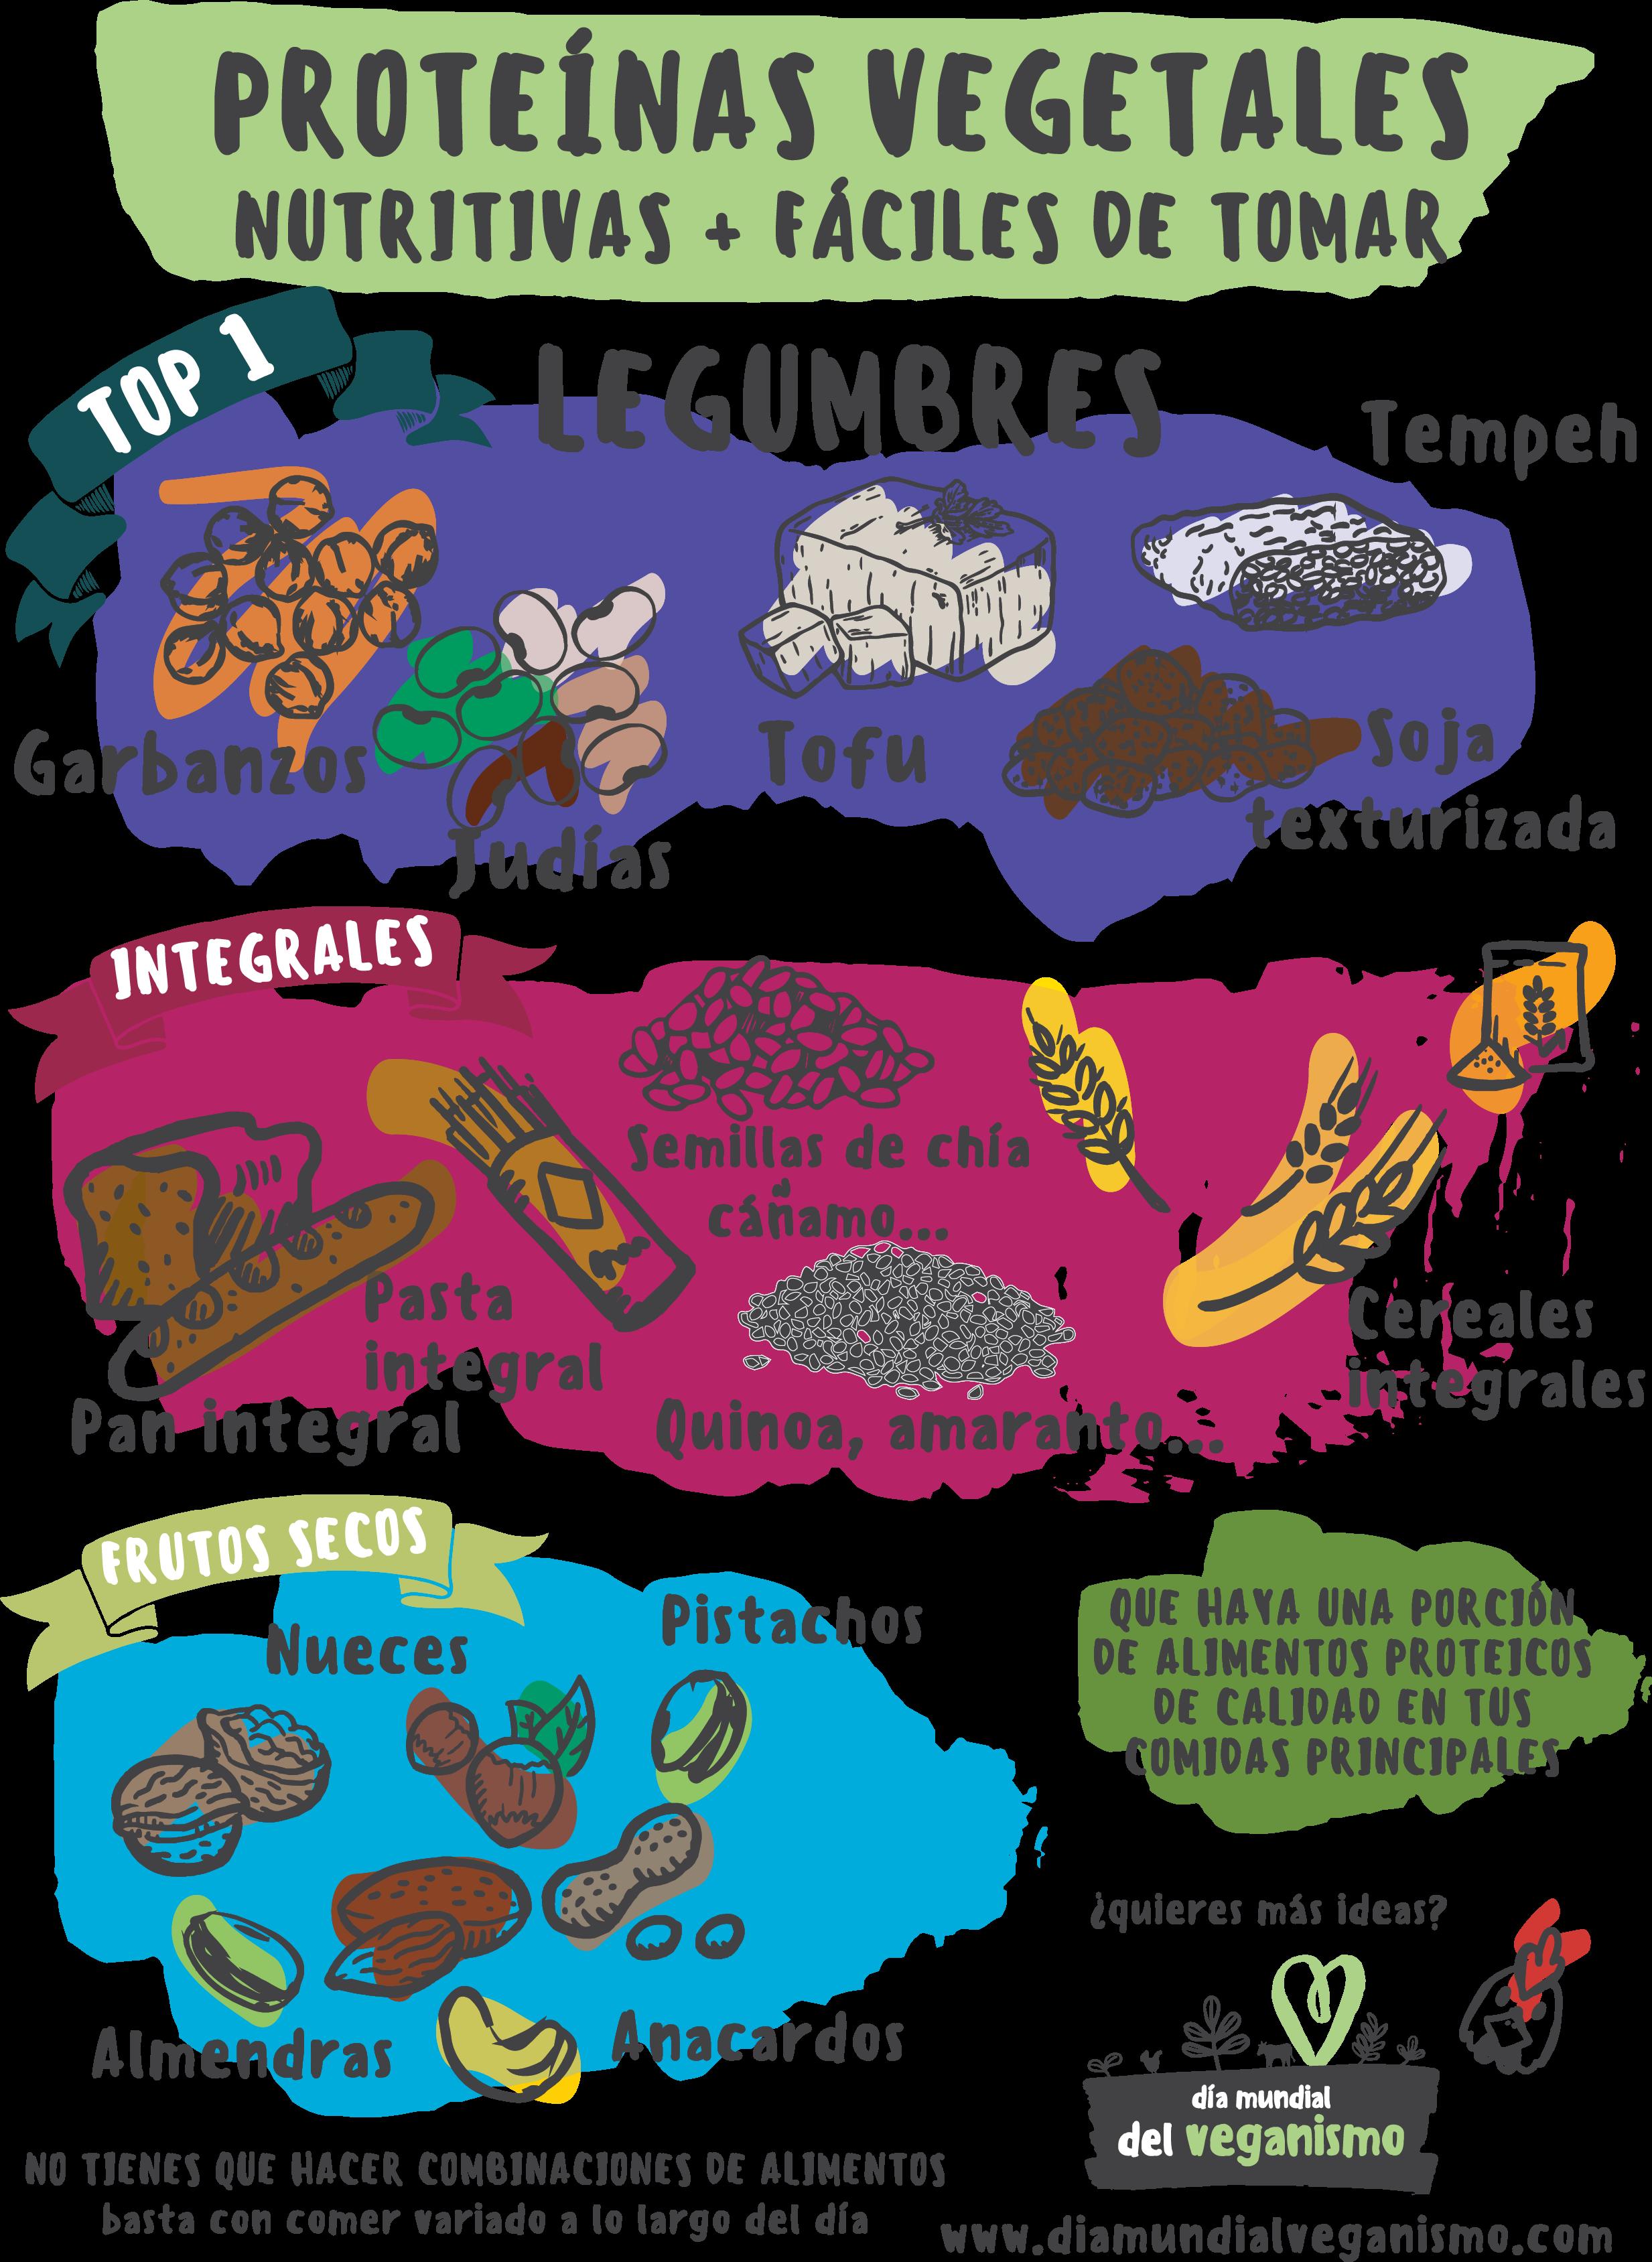 Proteínas vegetales: infografía